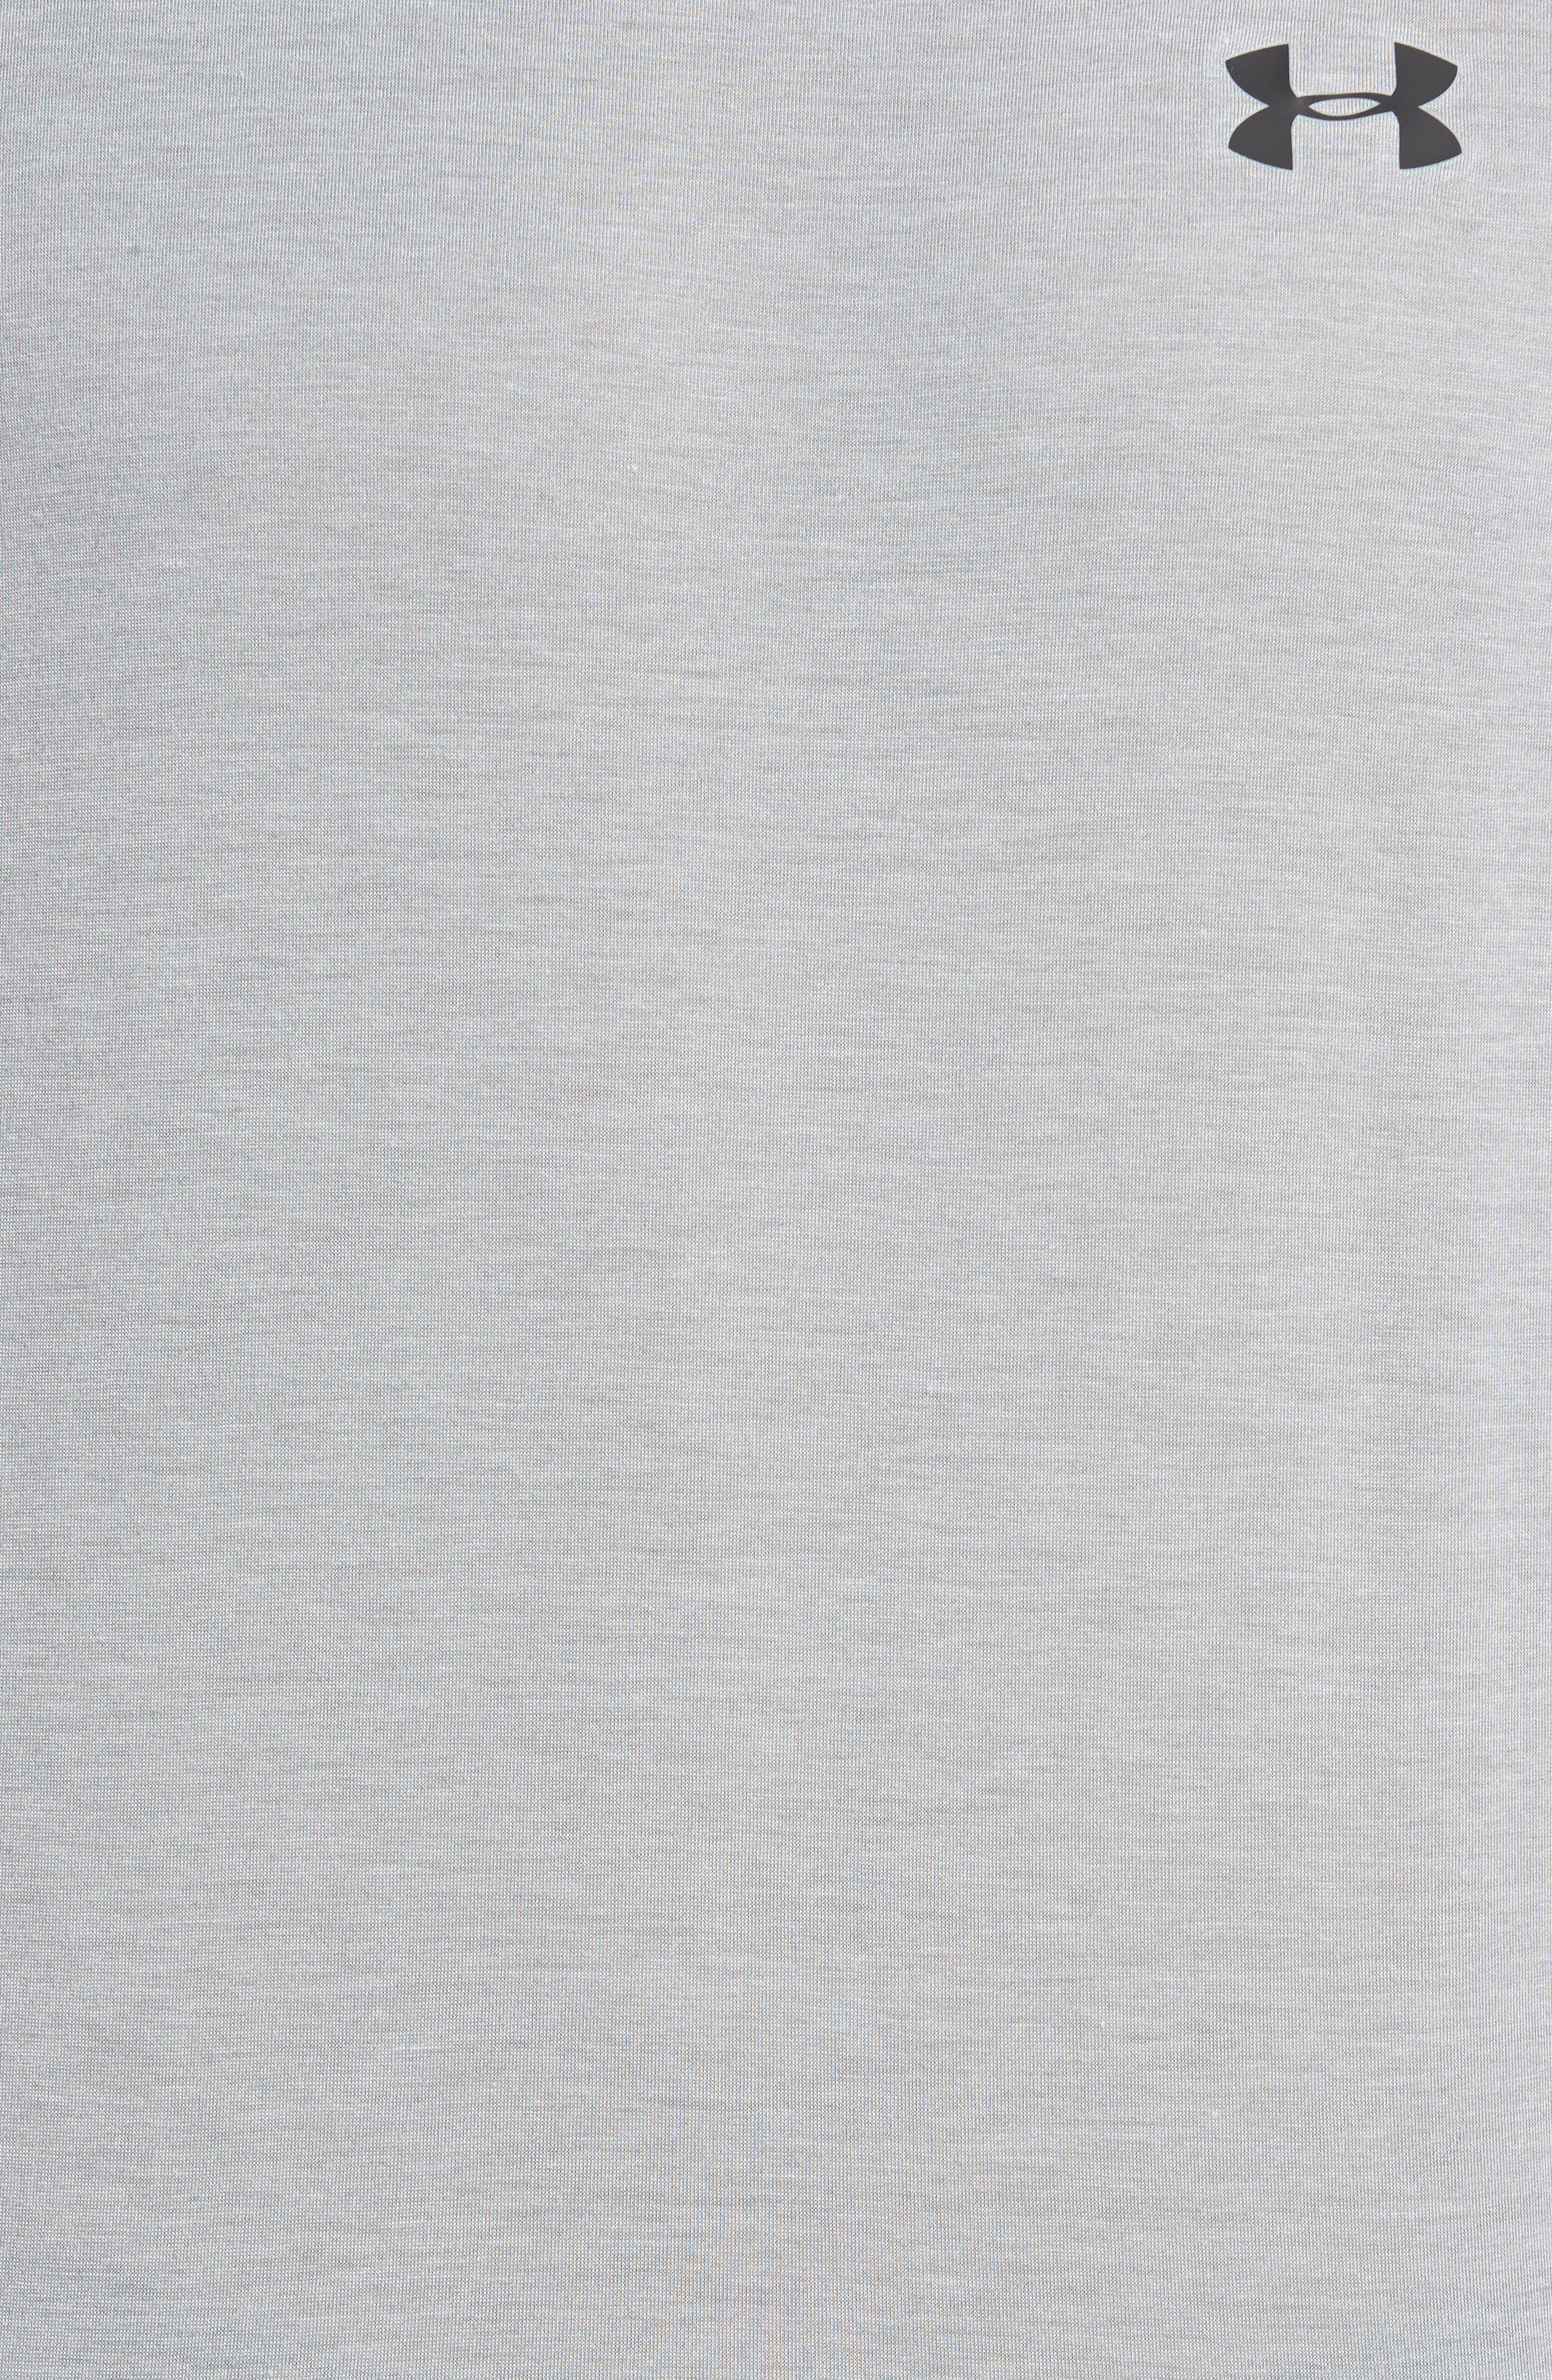 Threadborne Muscle Tee,                             Alternate thumbnail 6, color,                             True Grey Heather/ Black